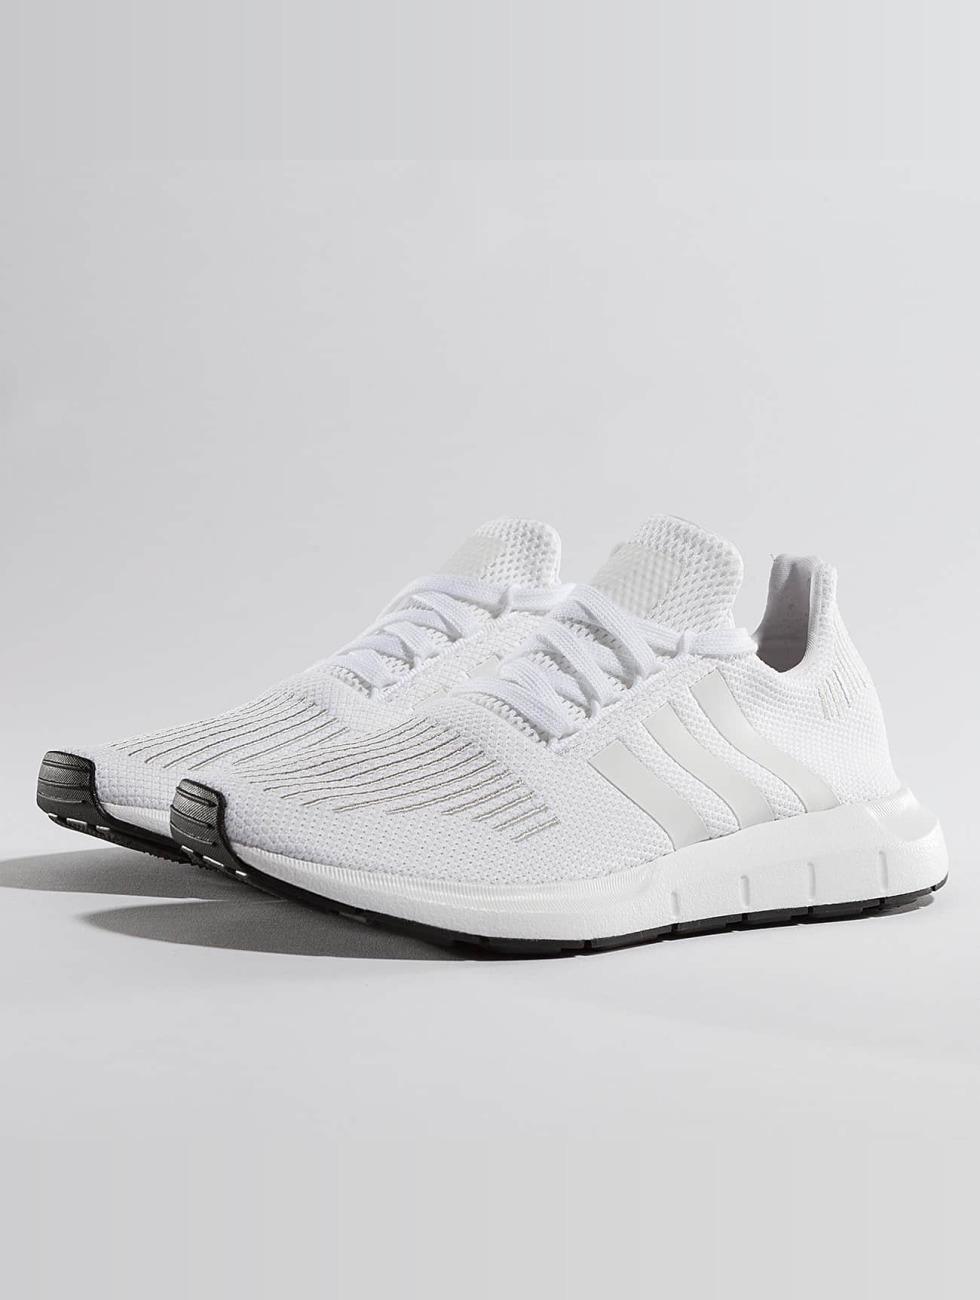 Adidas Originals Schoen / Sneaker Swift Run In Spirito 370836 fWO9wy